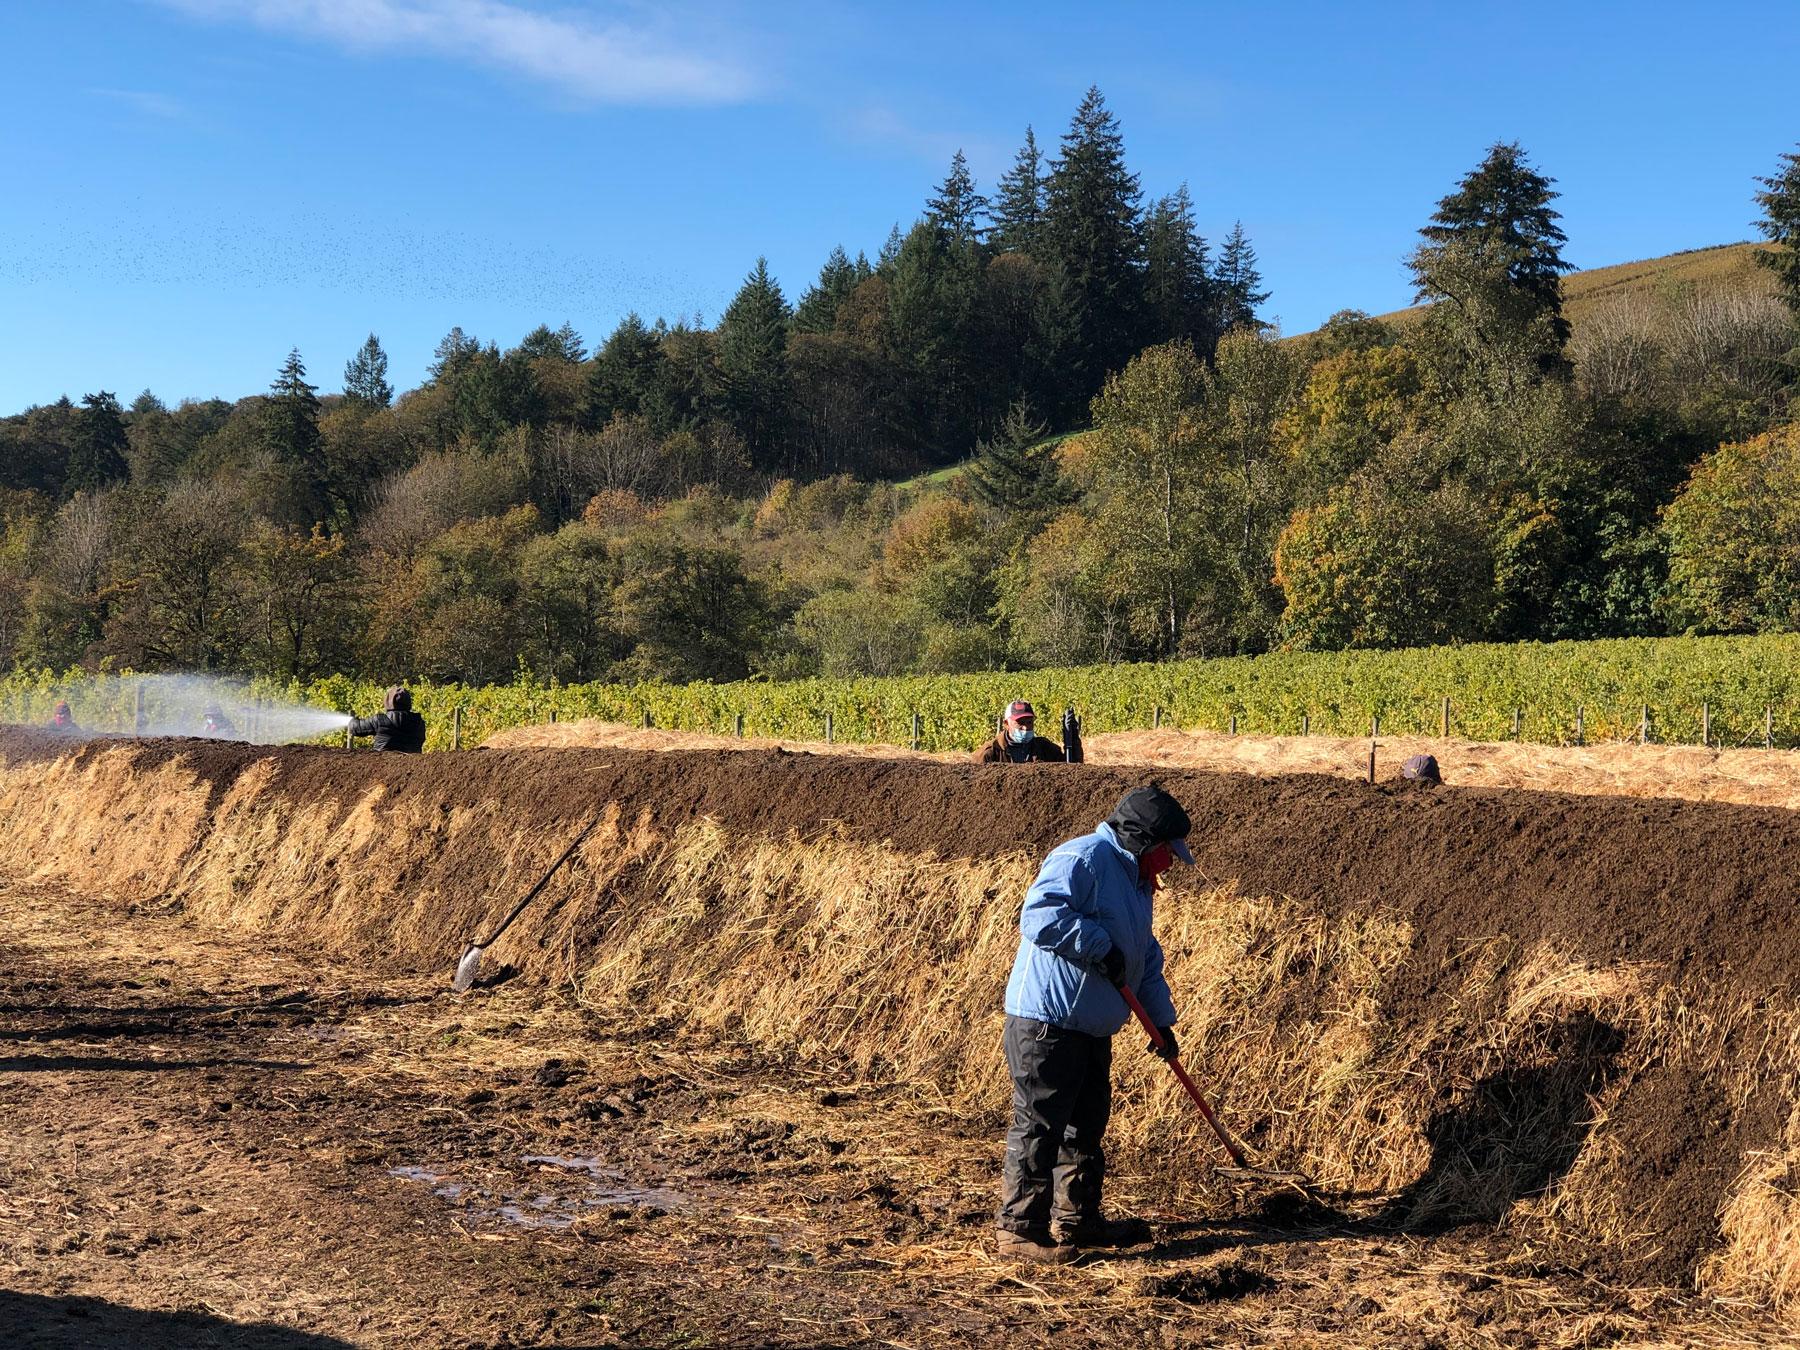 Biodynamic preparation work at Cristom Vineyards